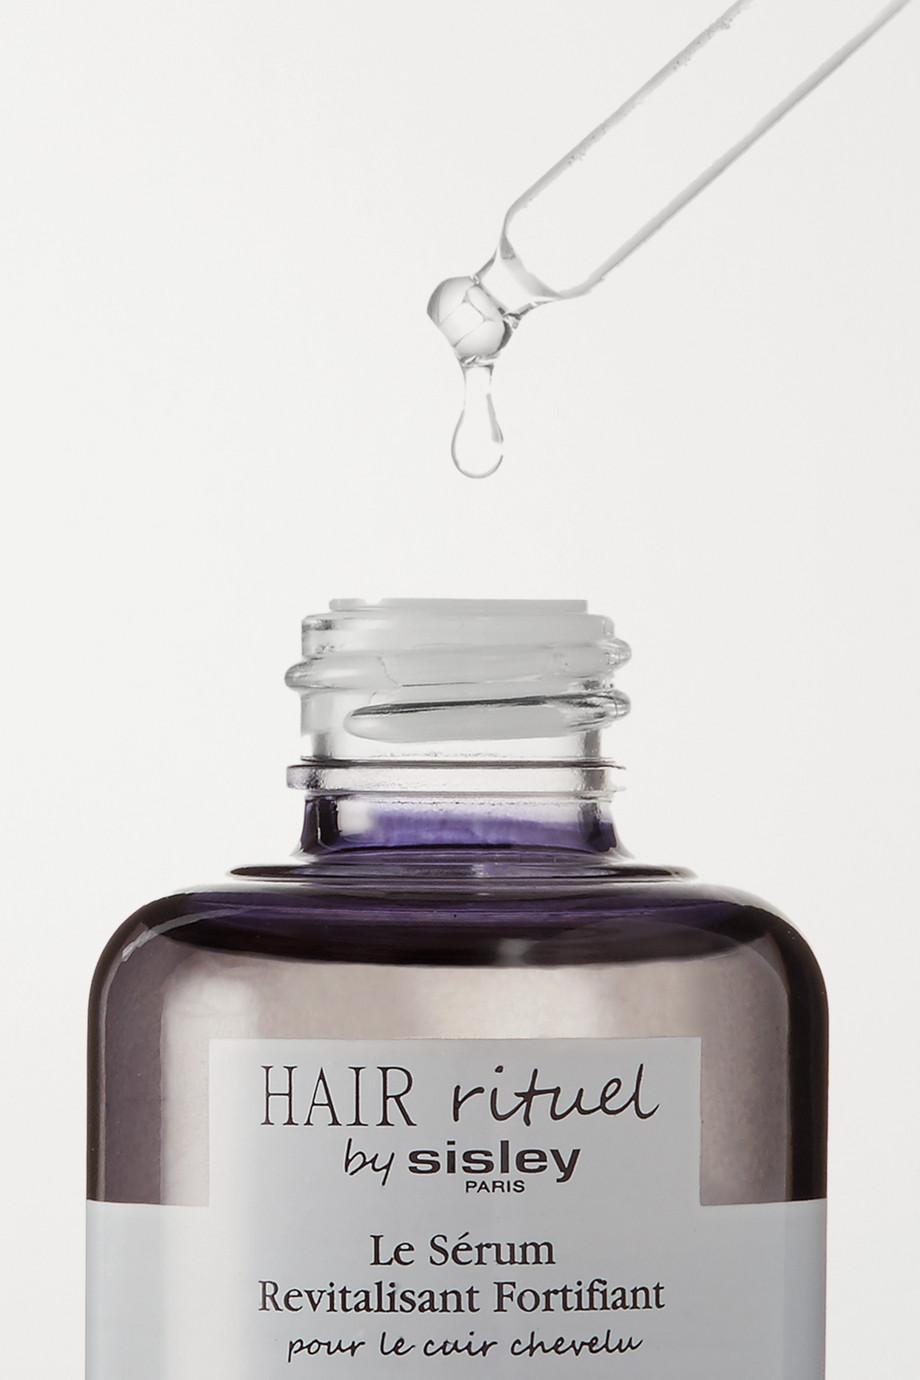 HAIR rituel by Sisley Revitalising Fortifying Serum for Scalp, 60ml